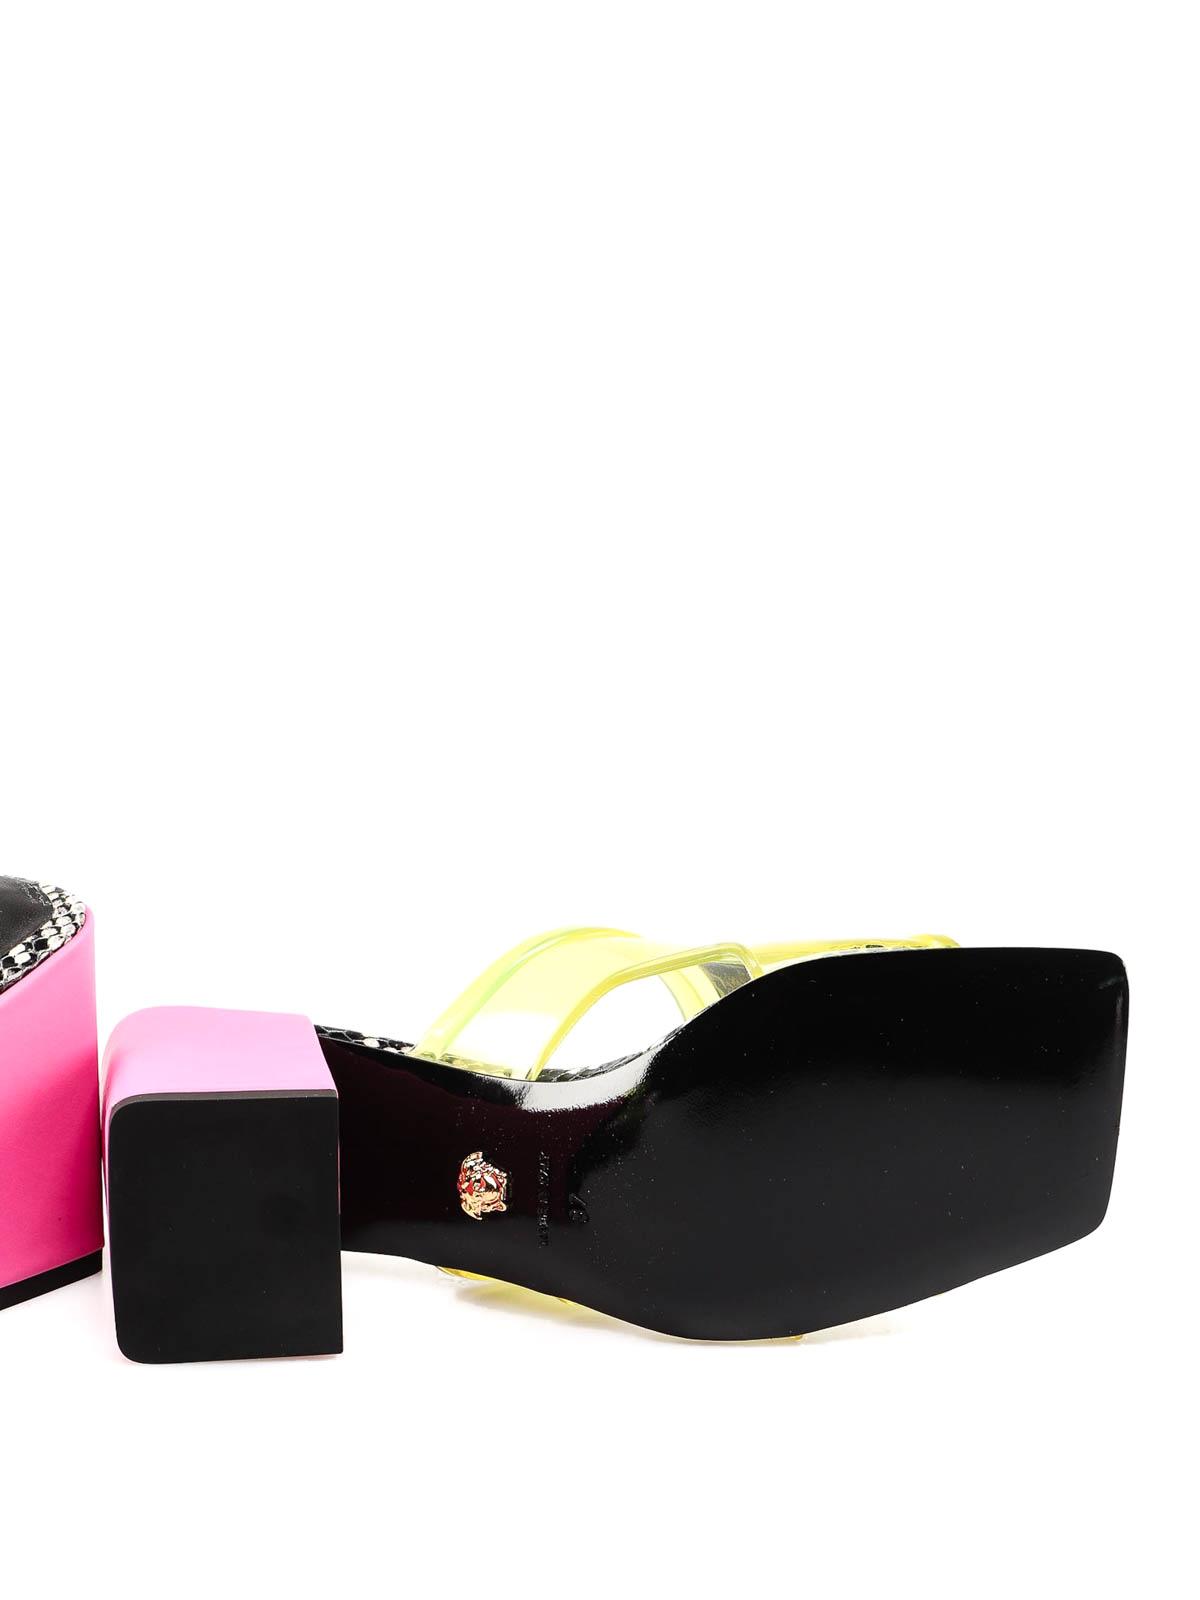 Versace - 90s Vintage sandals - sandals